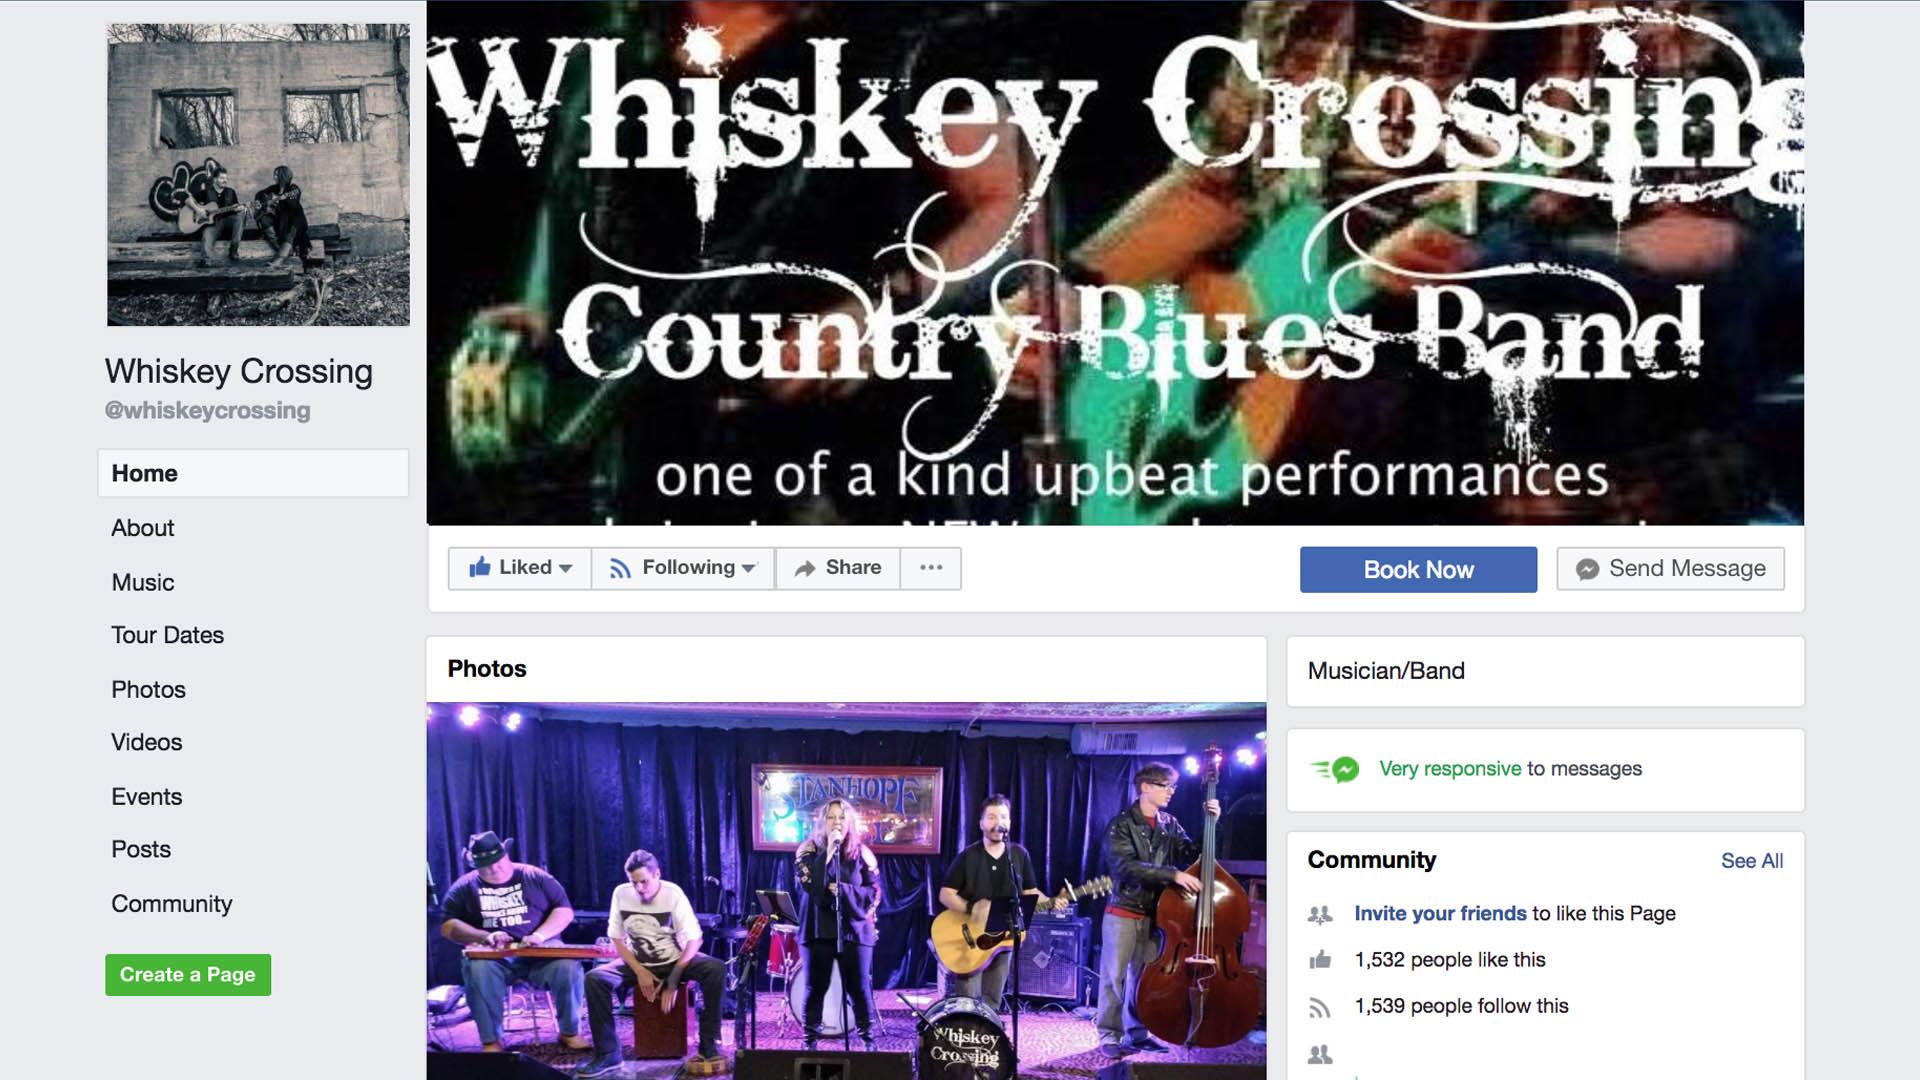 facebook.com/whiskeycrossing